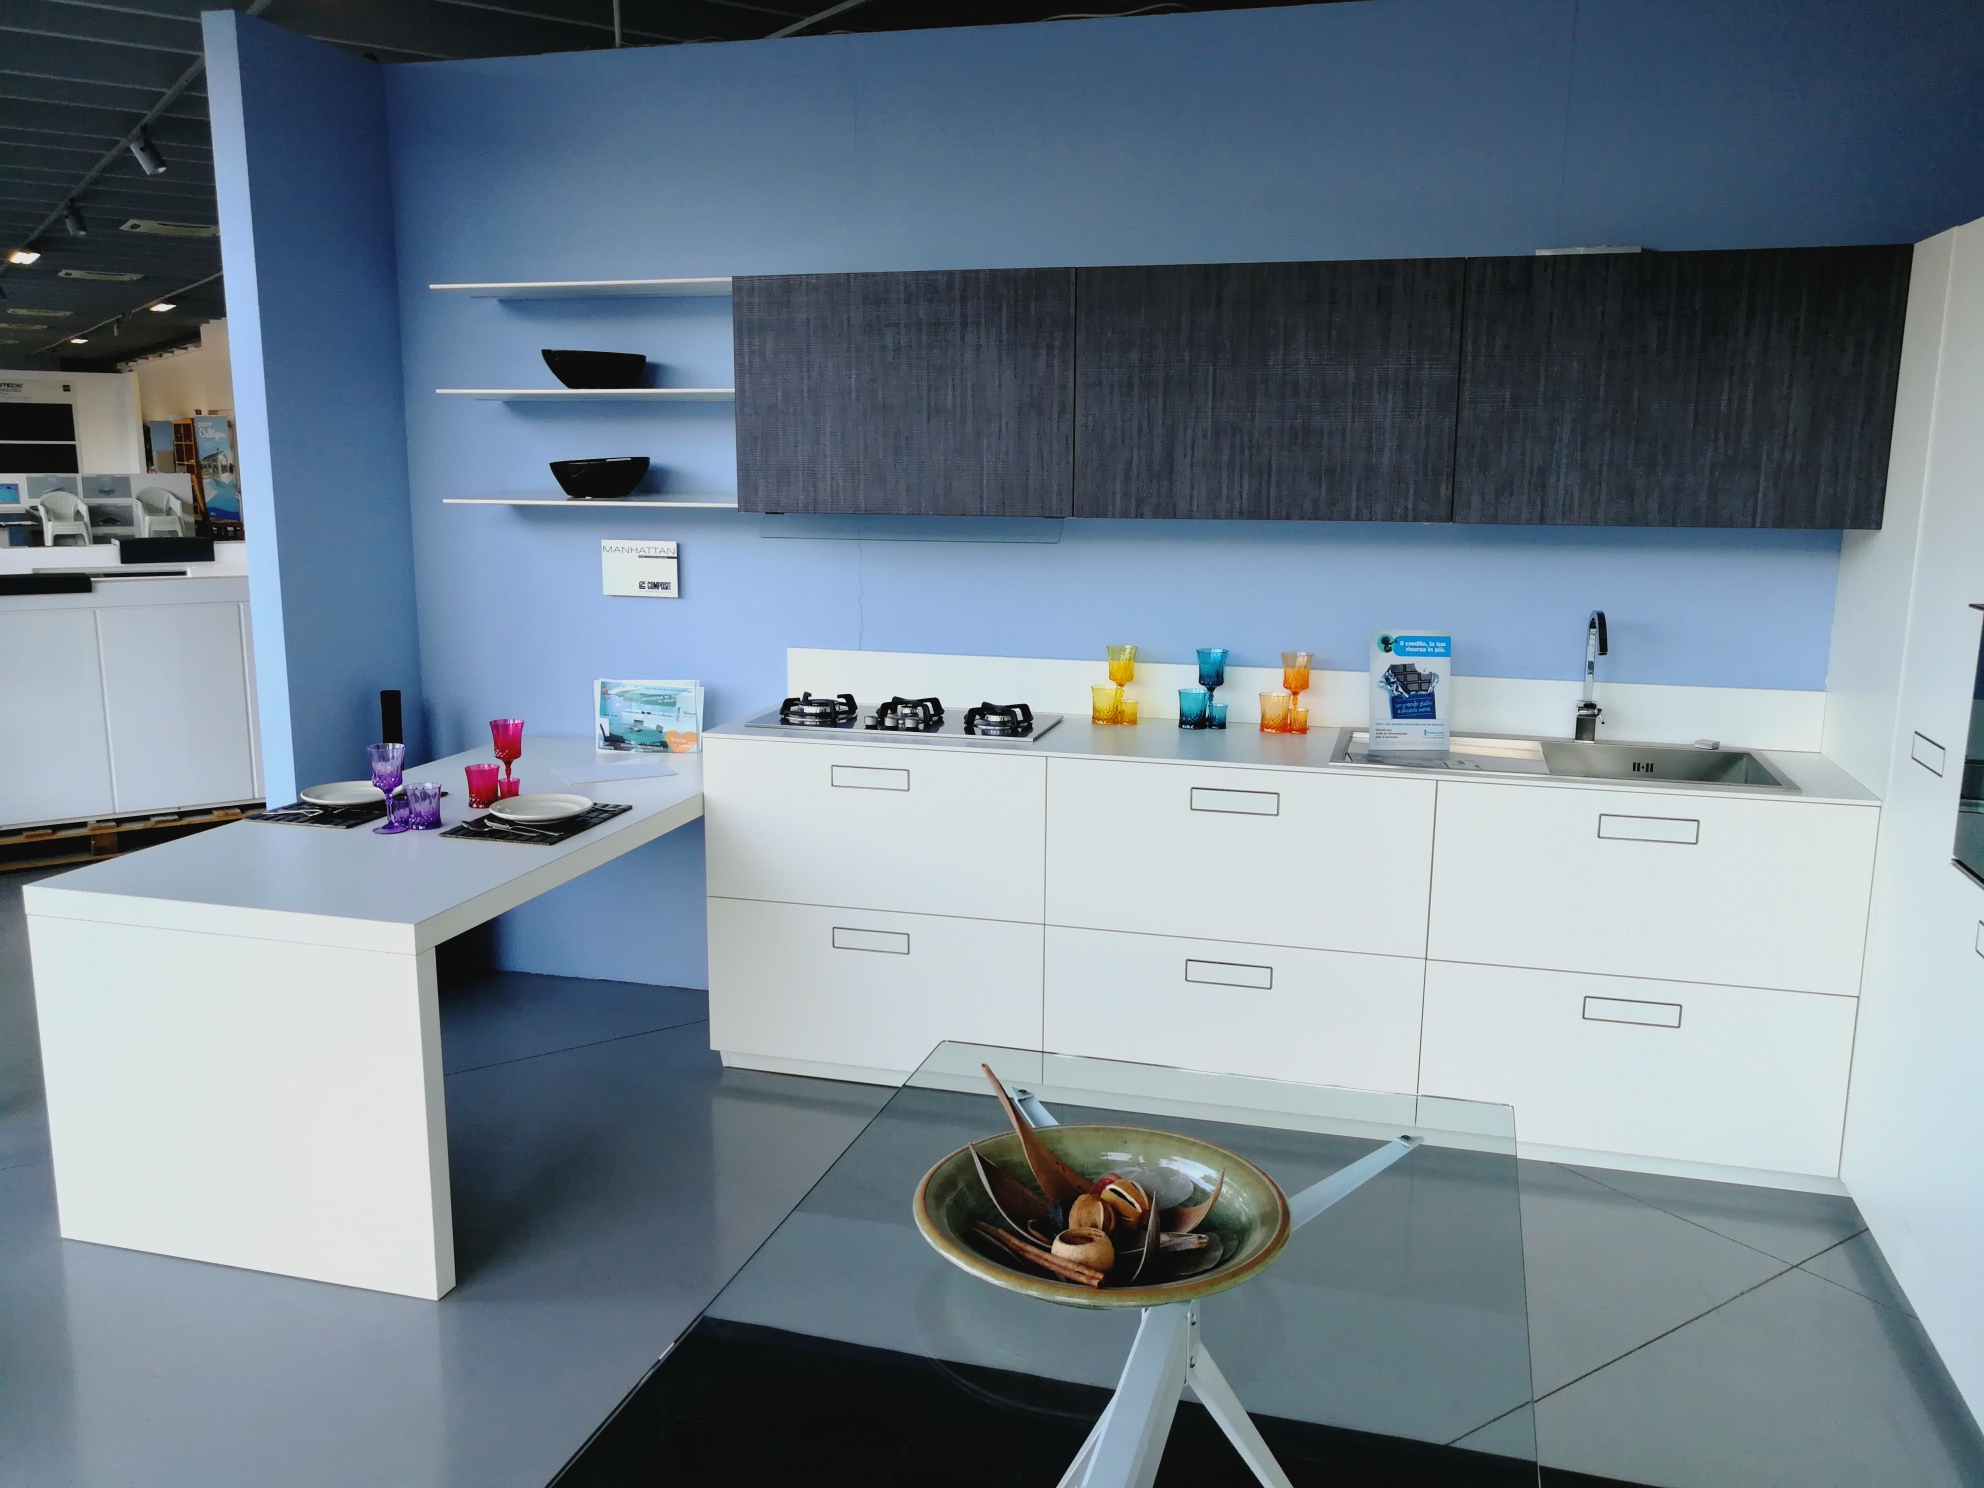 Cucine in ceramica archiproducts